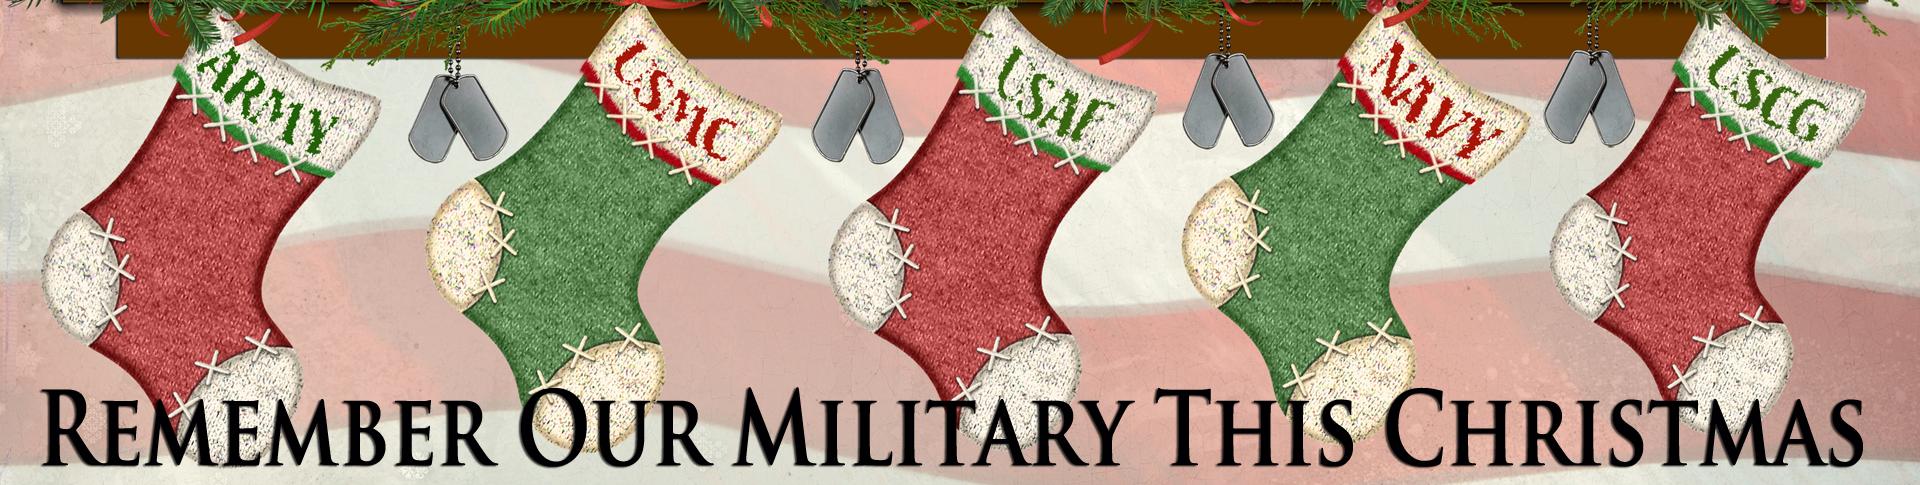 MilitaryStockings1920x485